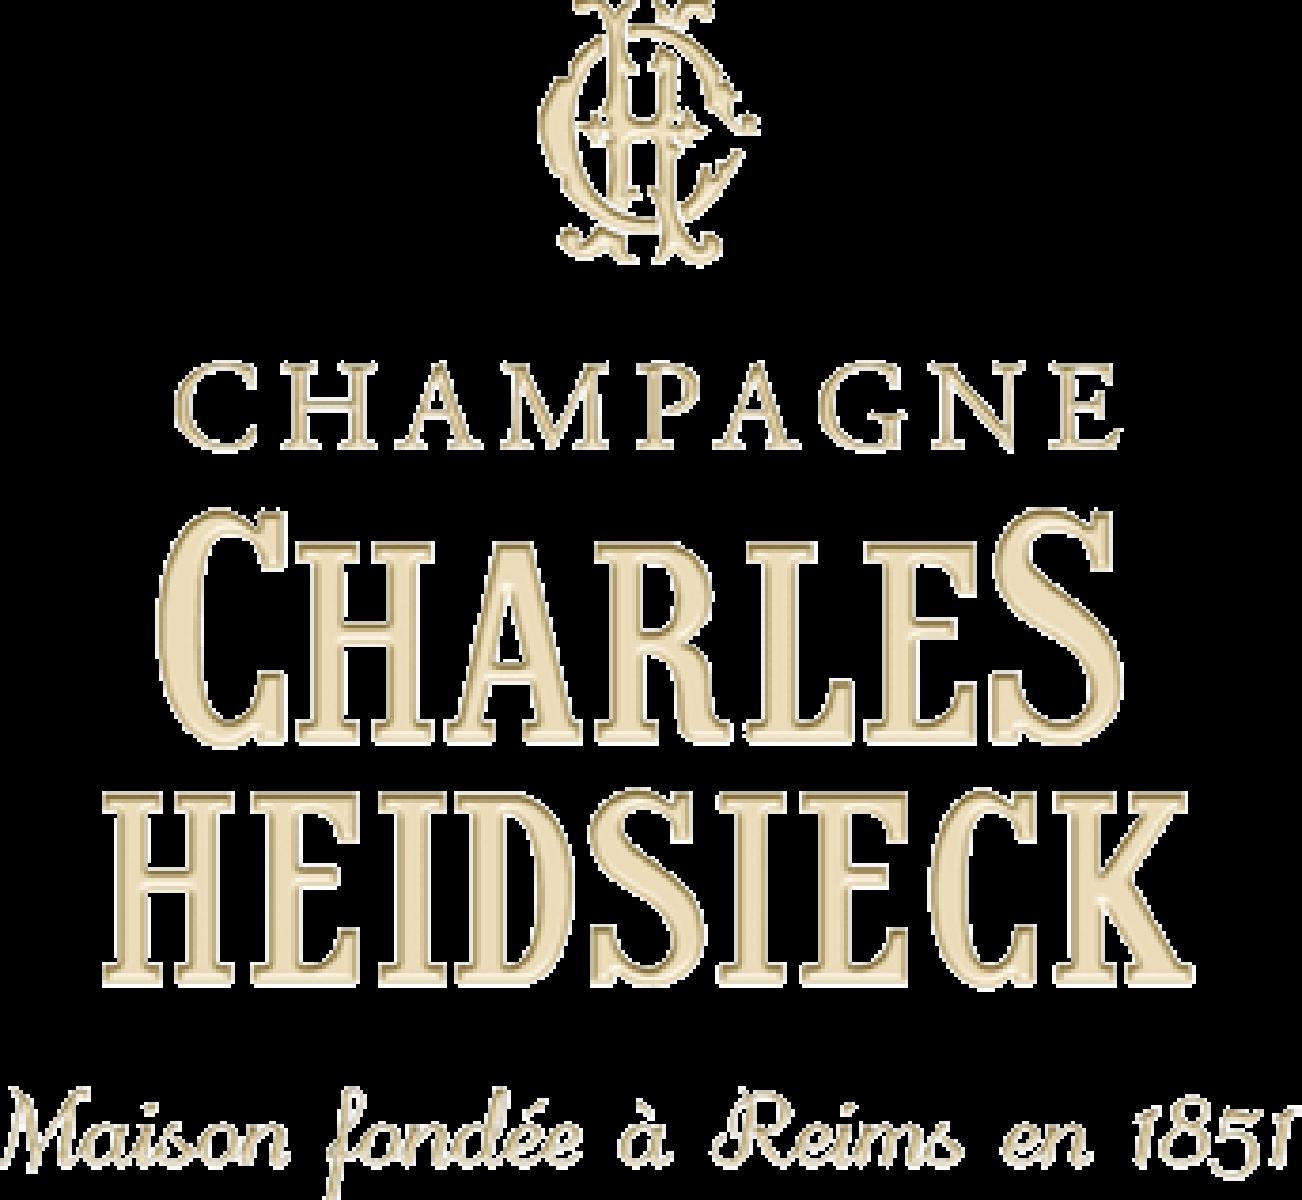 Maison Charles Heidsieck